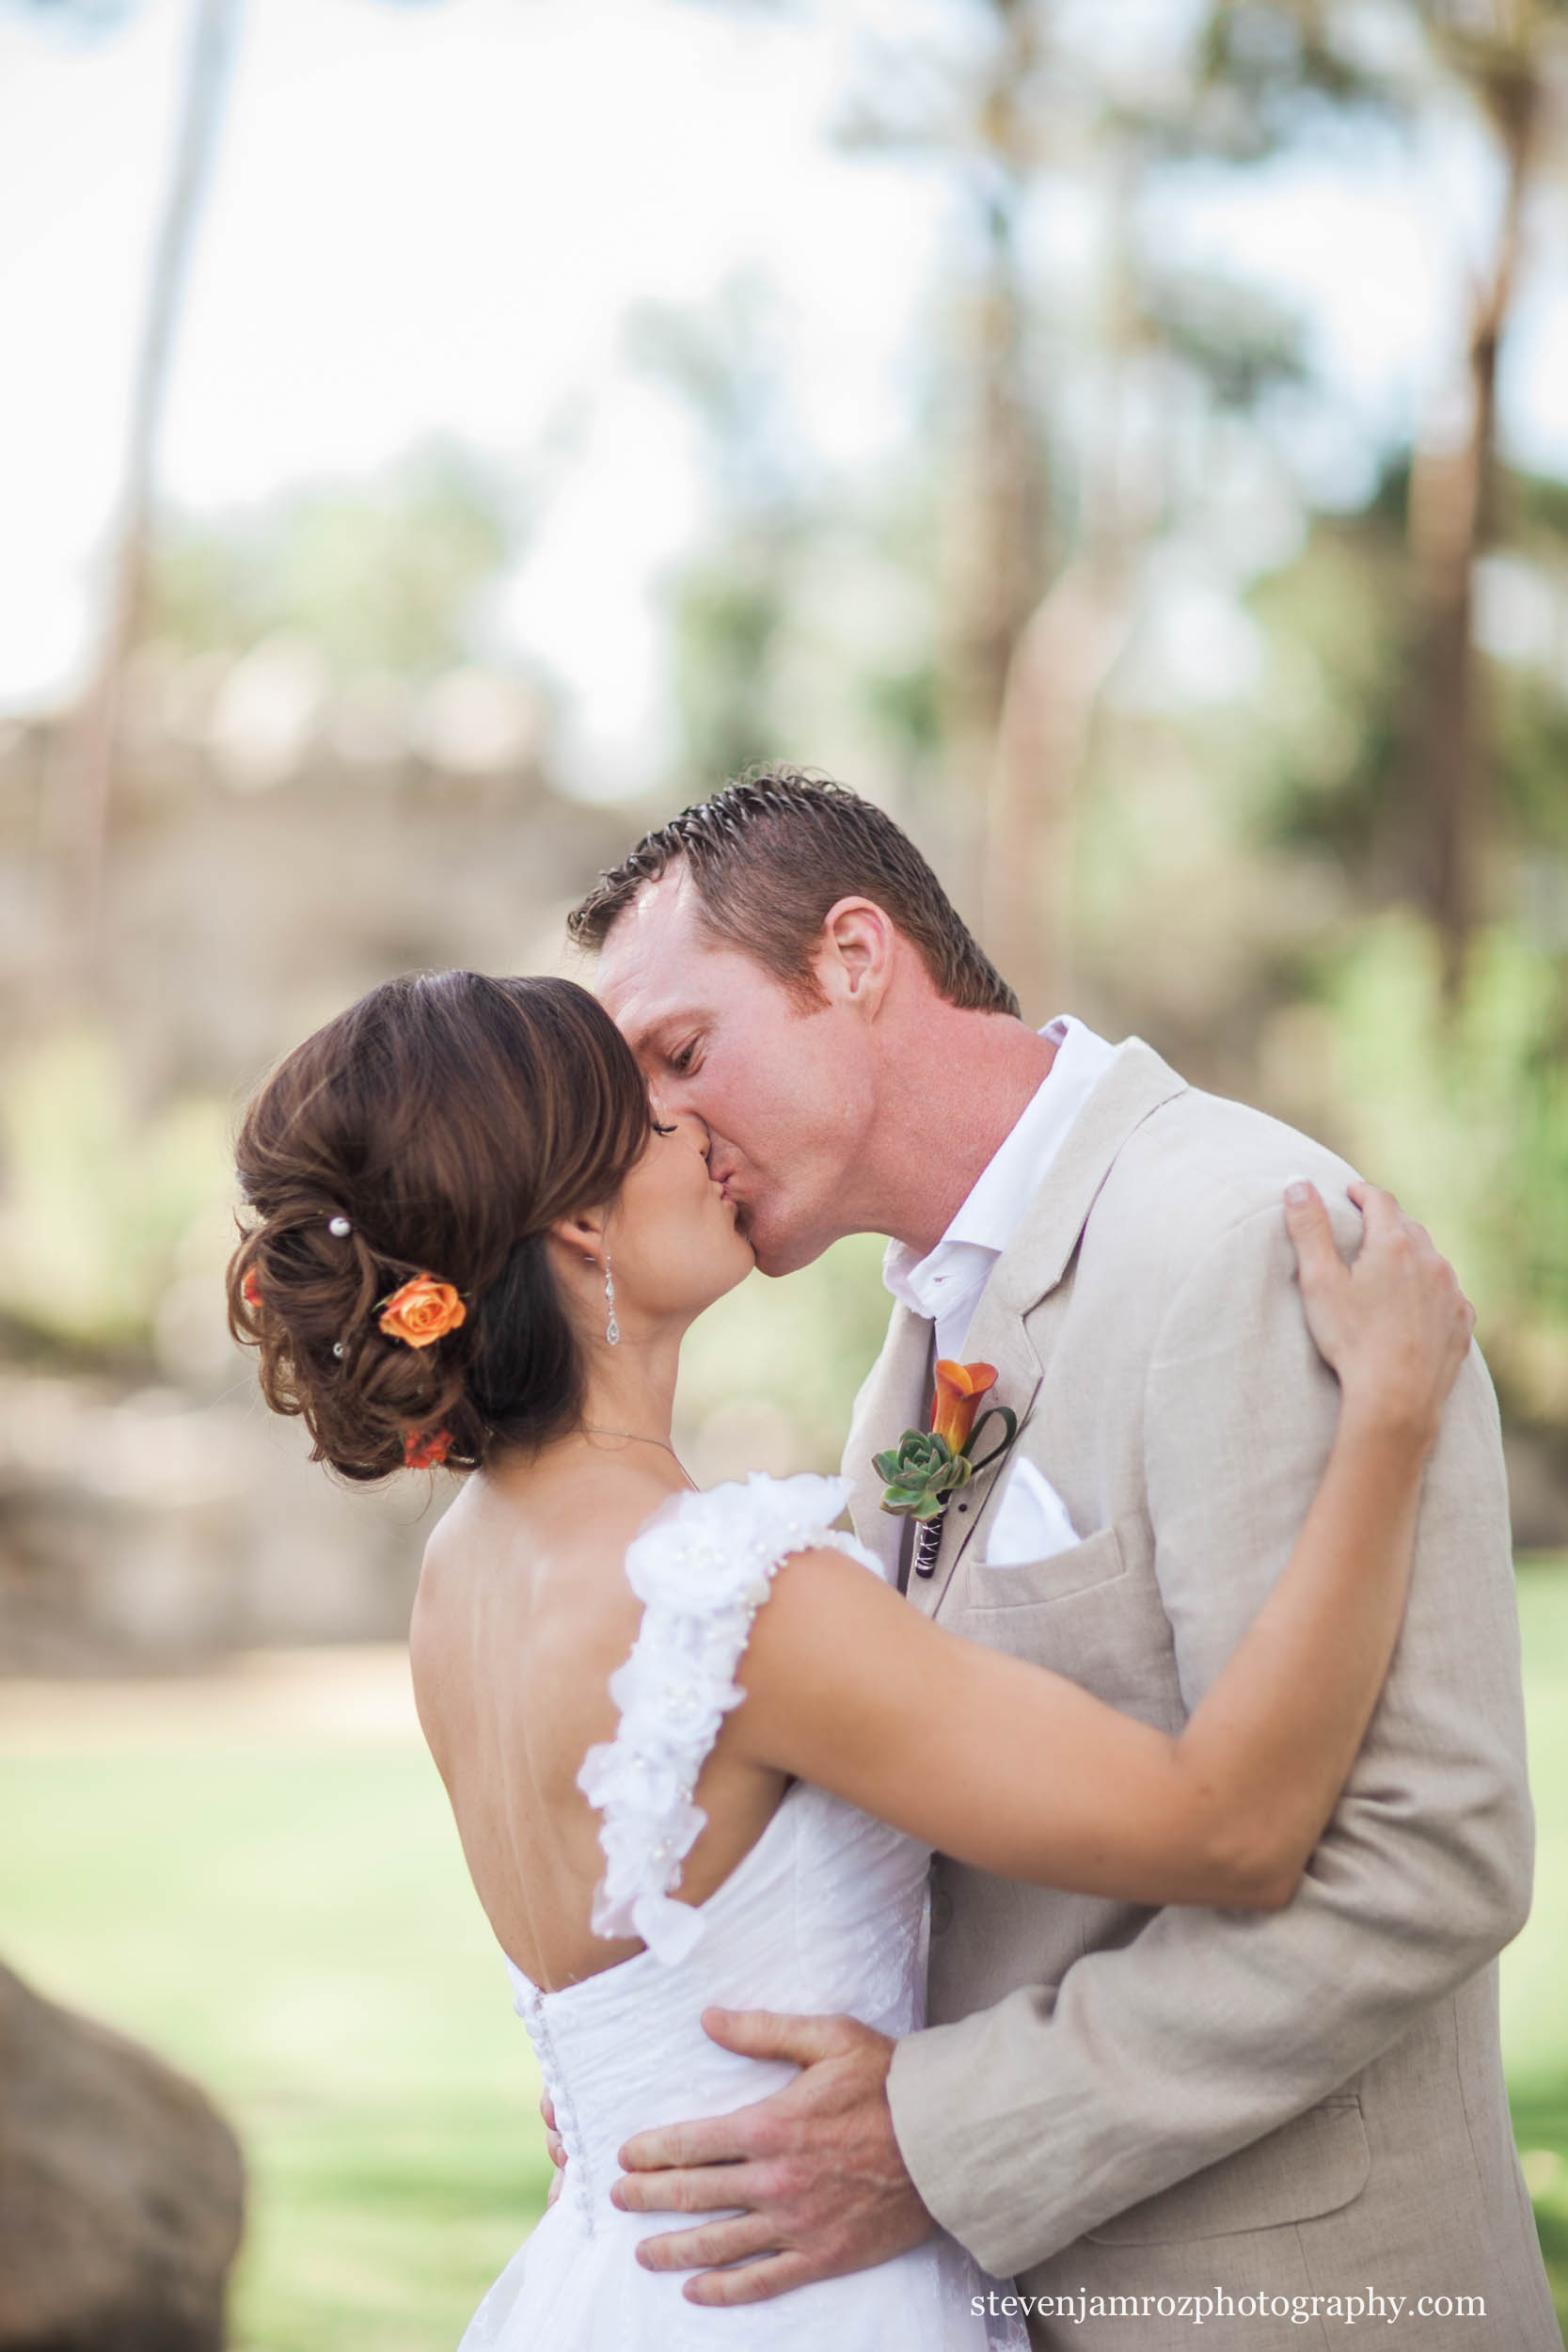 kiss-pretty-bride-groom-raleigh-steven-jamroz-photography-0008.jpg